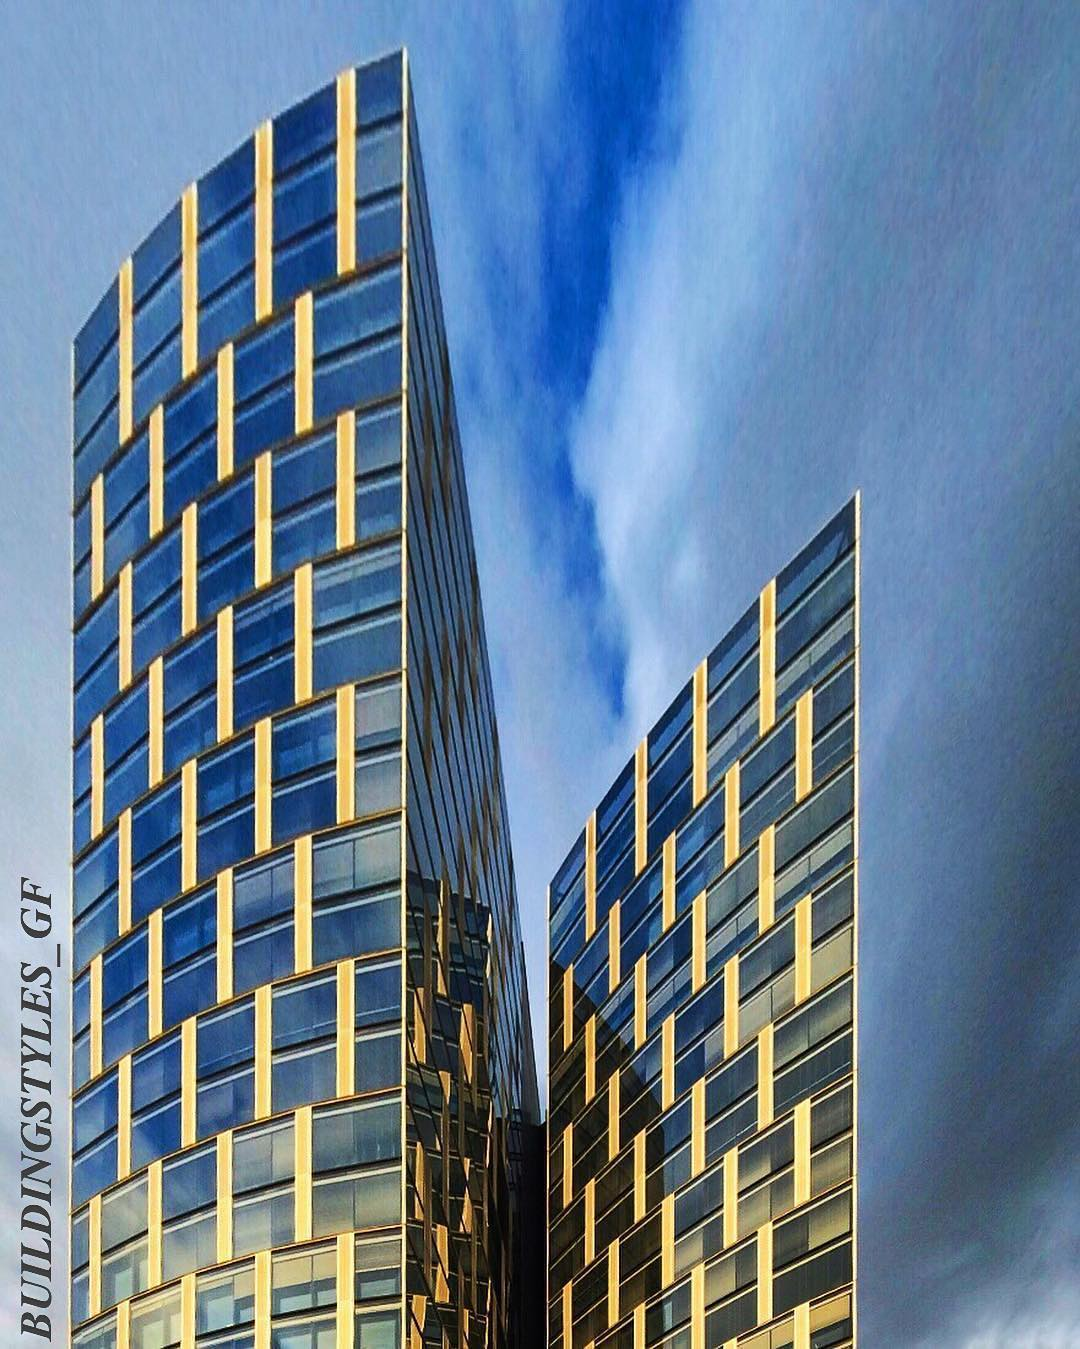 imagenes-de-edificios-modernos1164